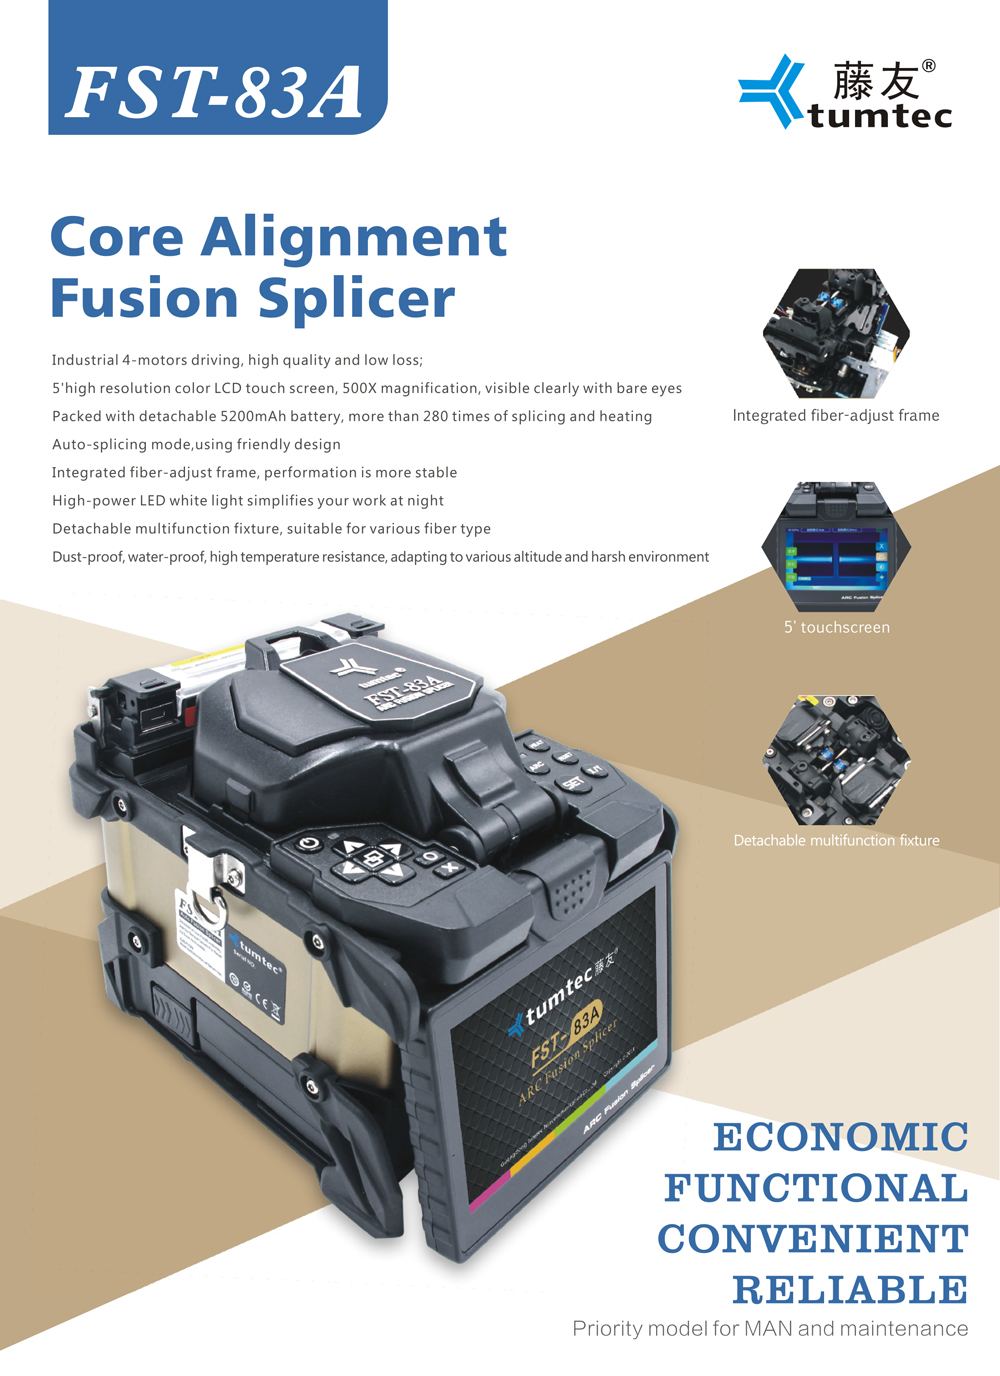 Tumtec fst 83a core alignment 6s машина для быстрого сращивания